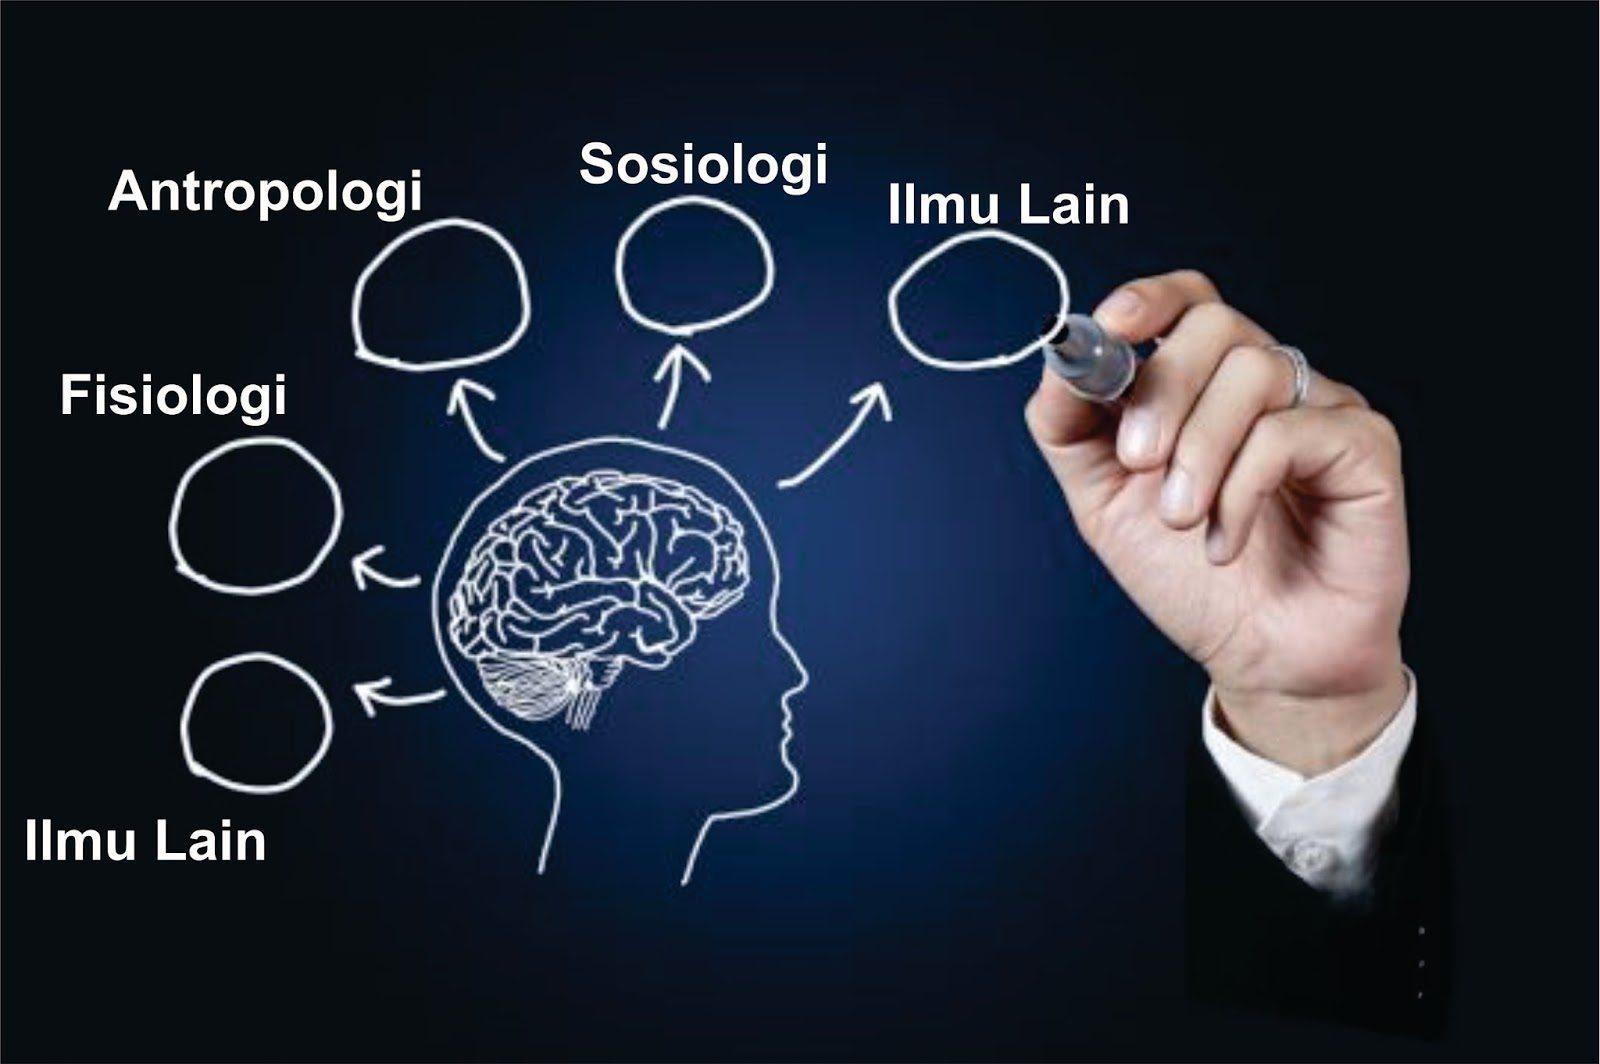 Psikologi sebagai Penambah Ilmu lainnya